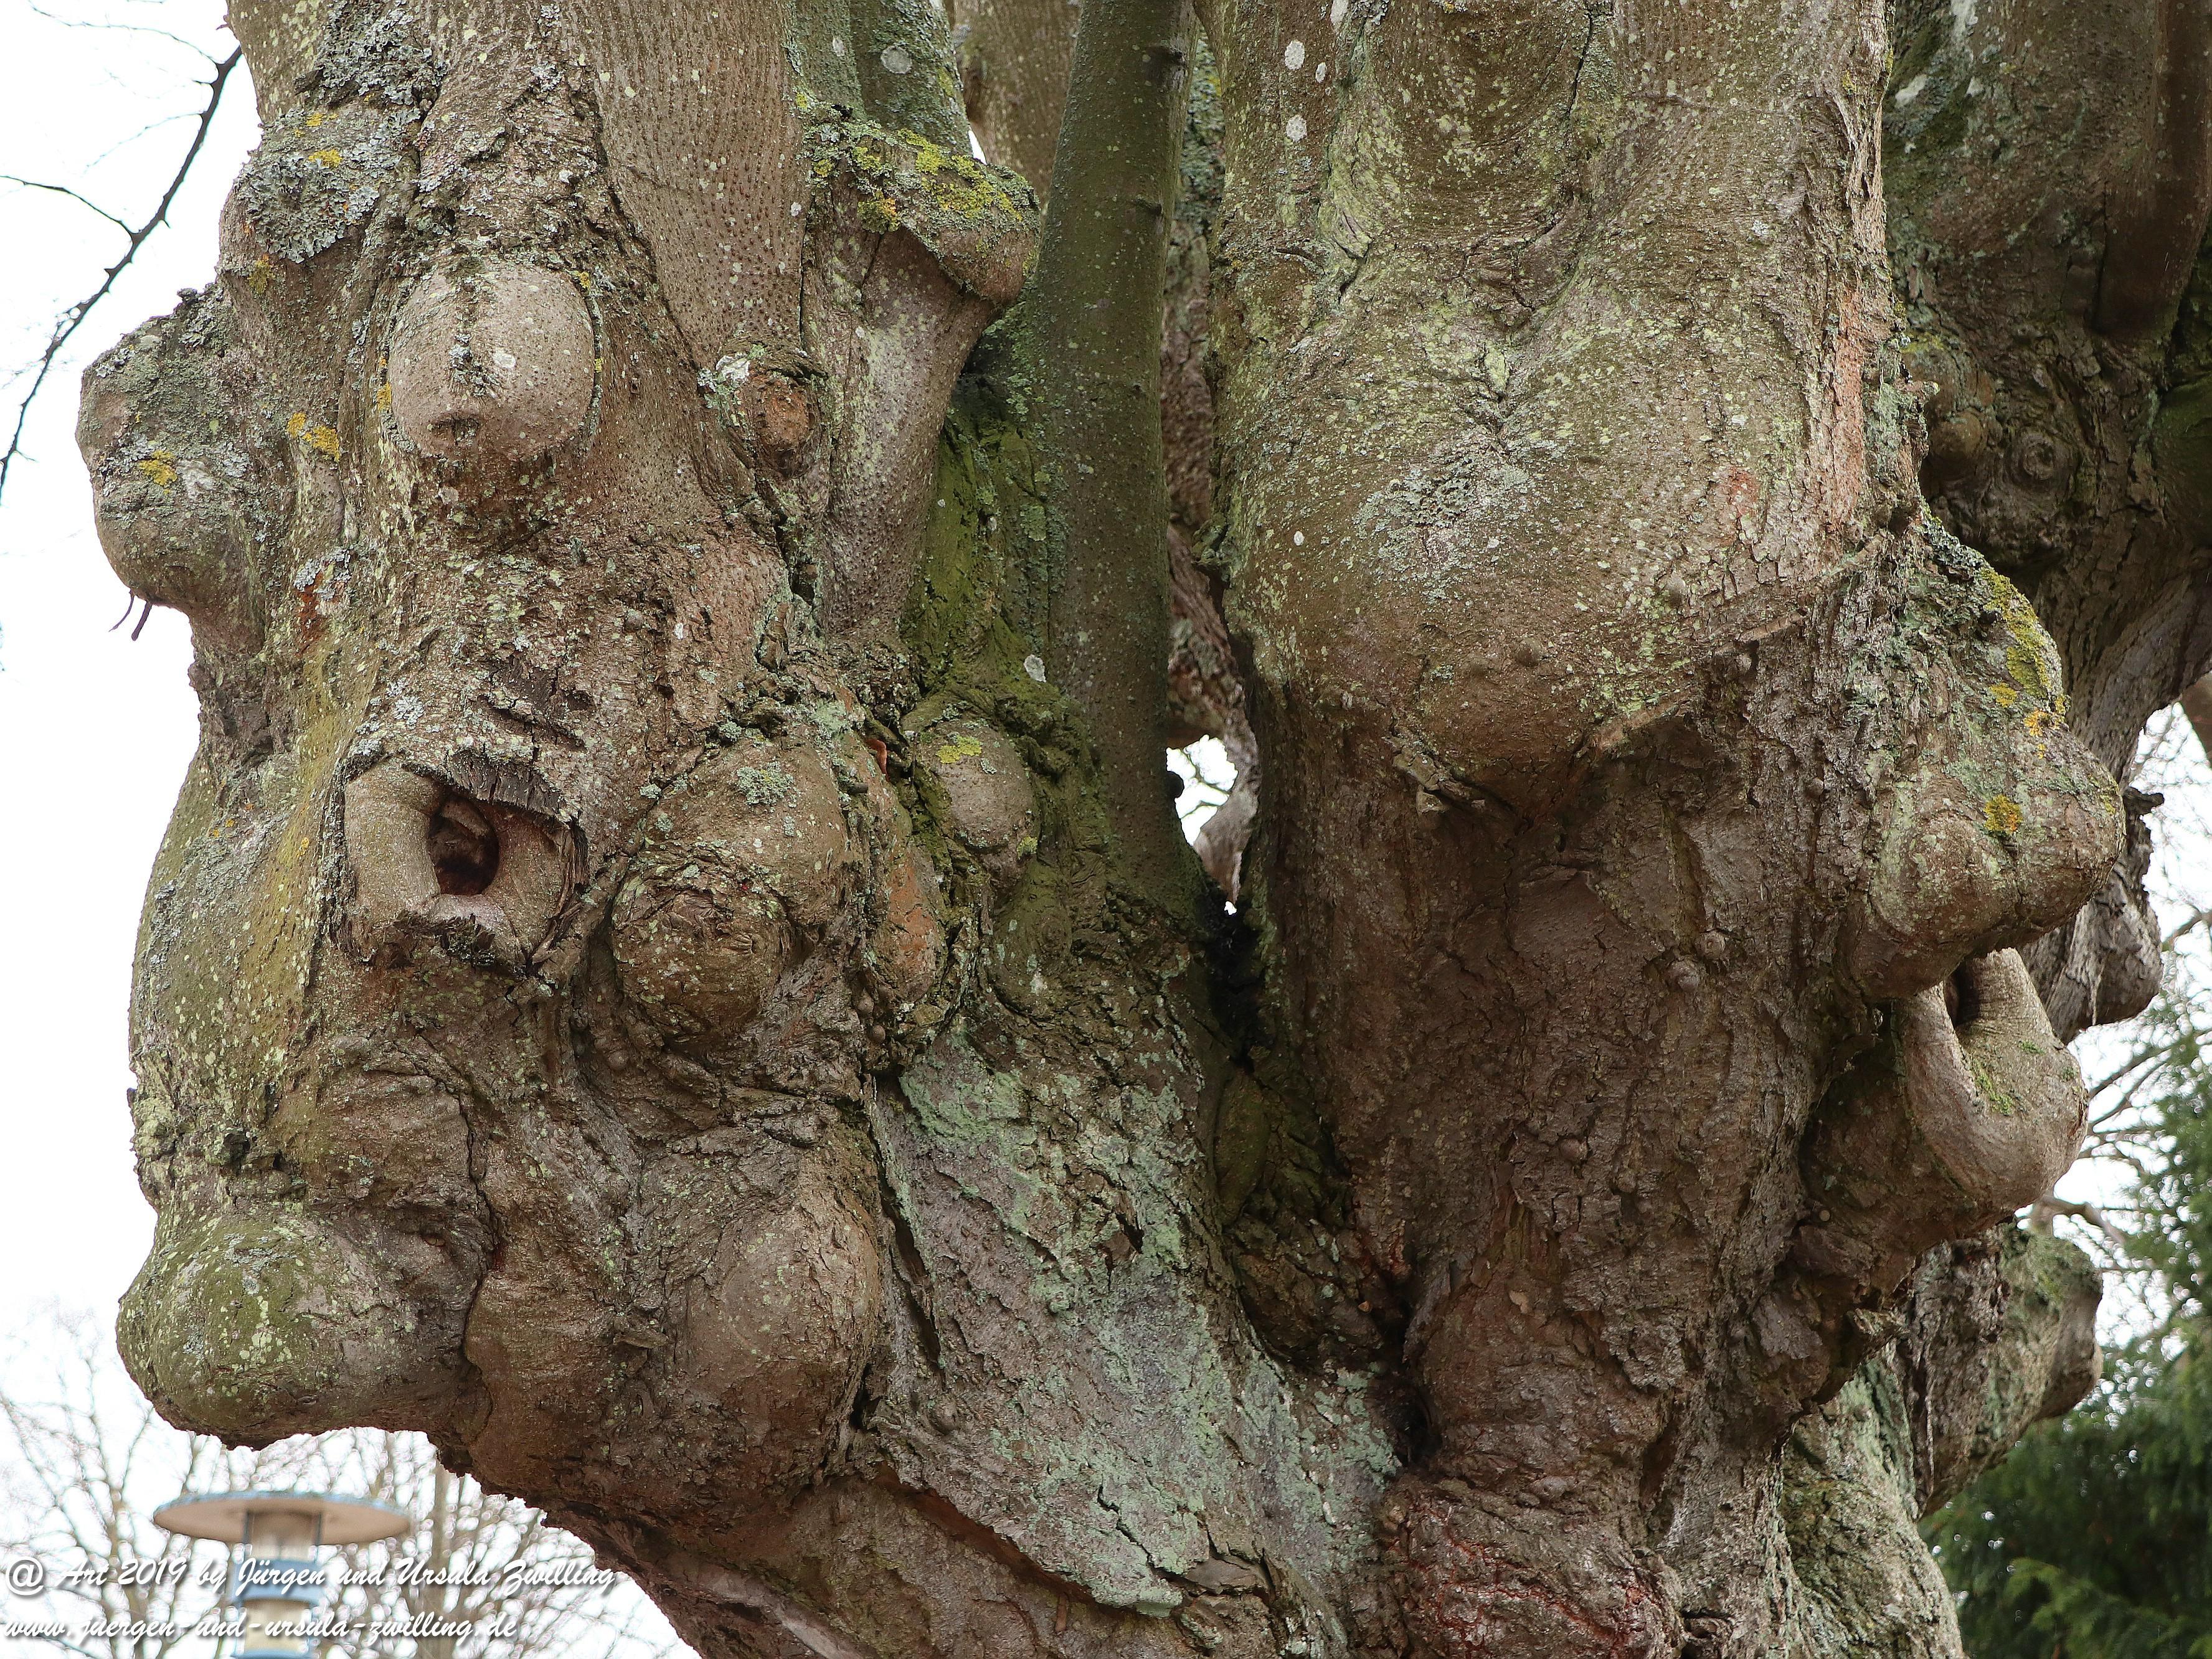 Zwillings - Baum - Gesichter